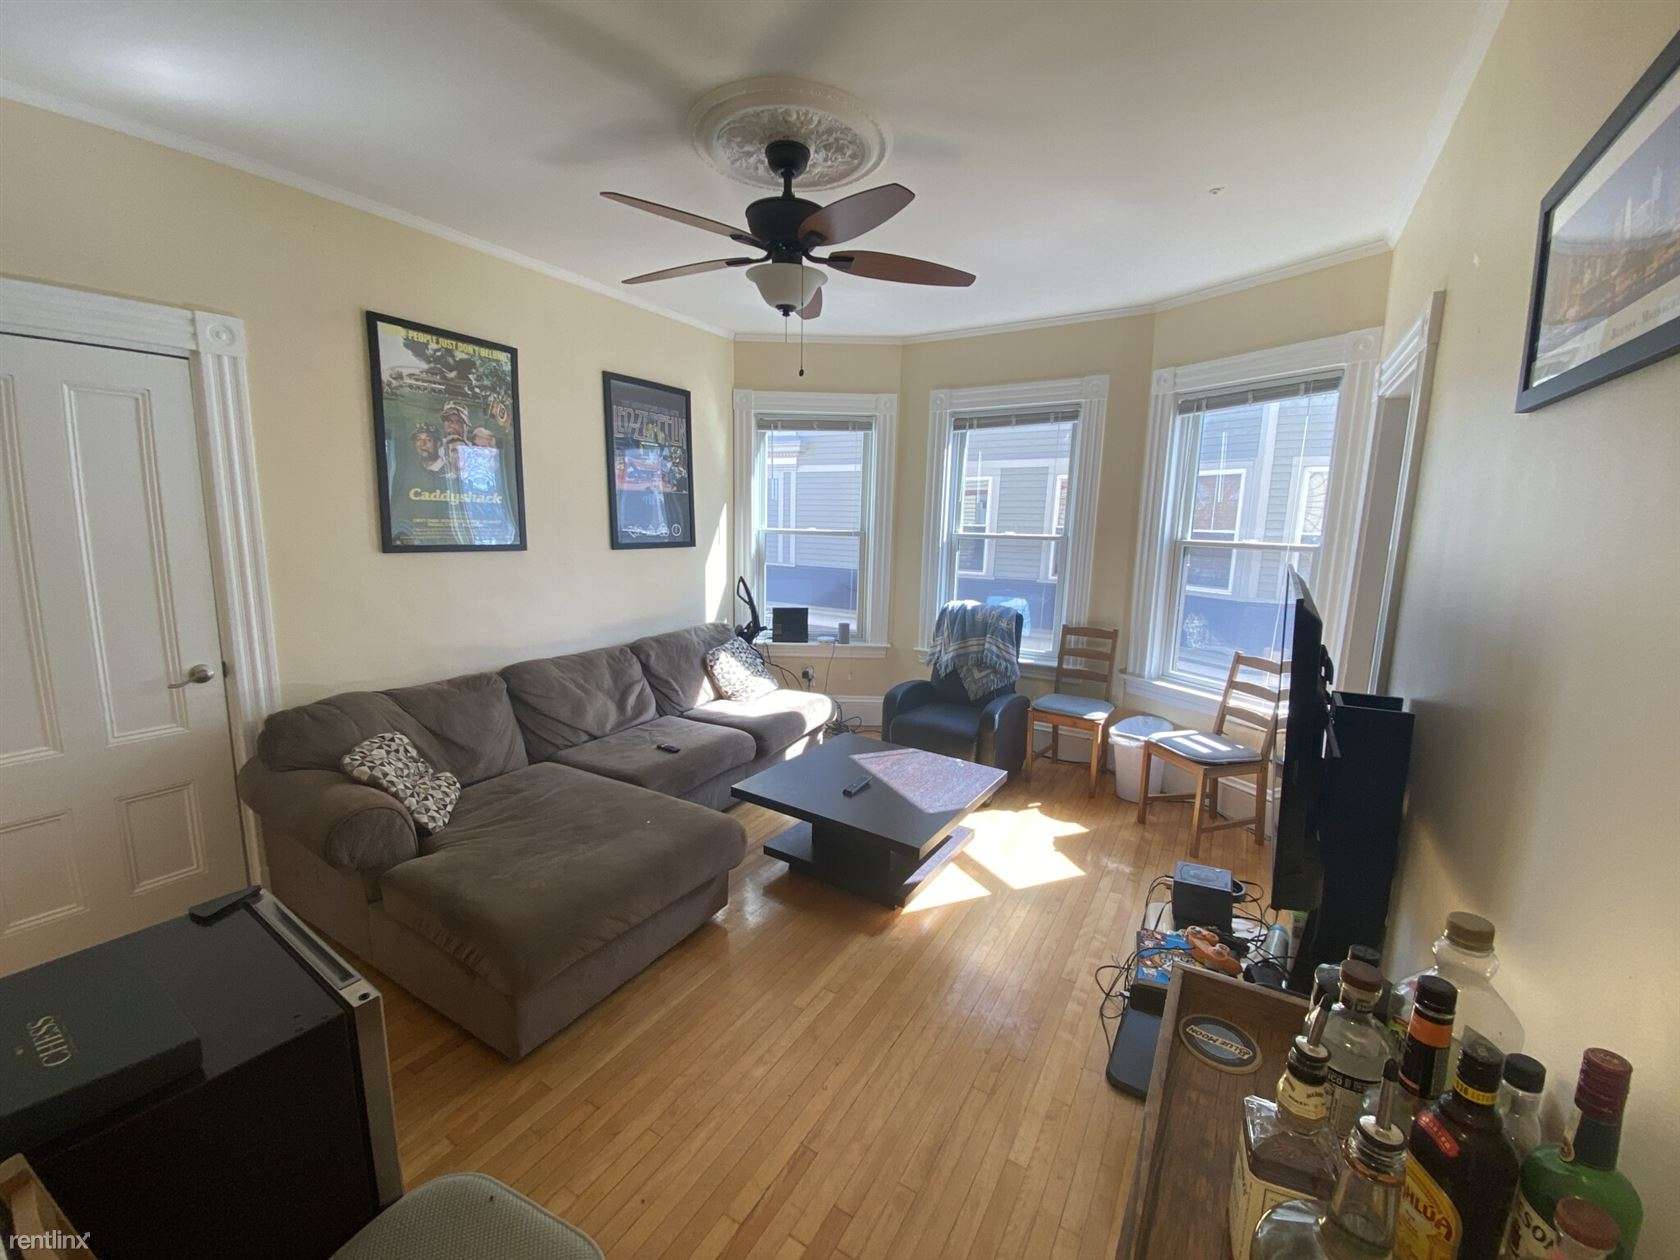 176 Elm St # 2, North Cambridge, MA - $4,900 USD/ month